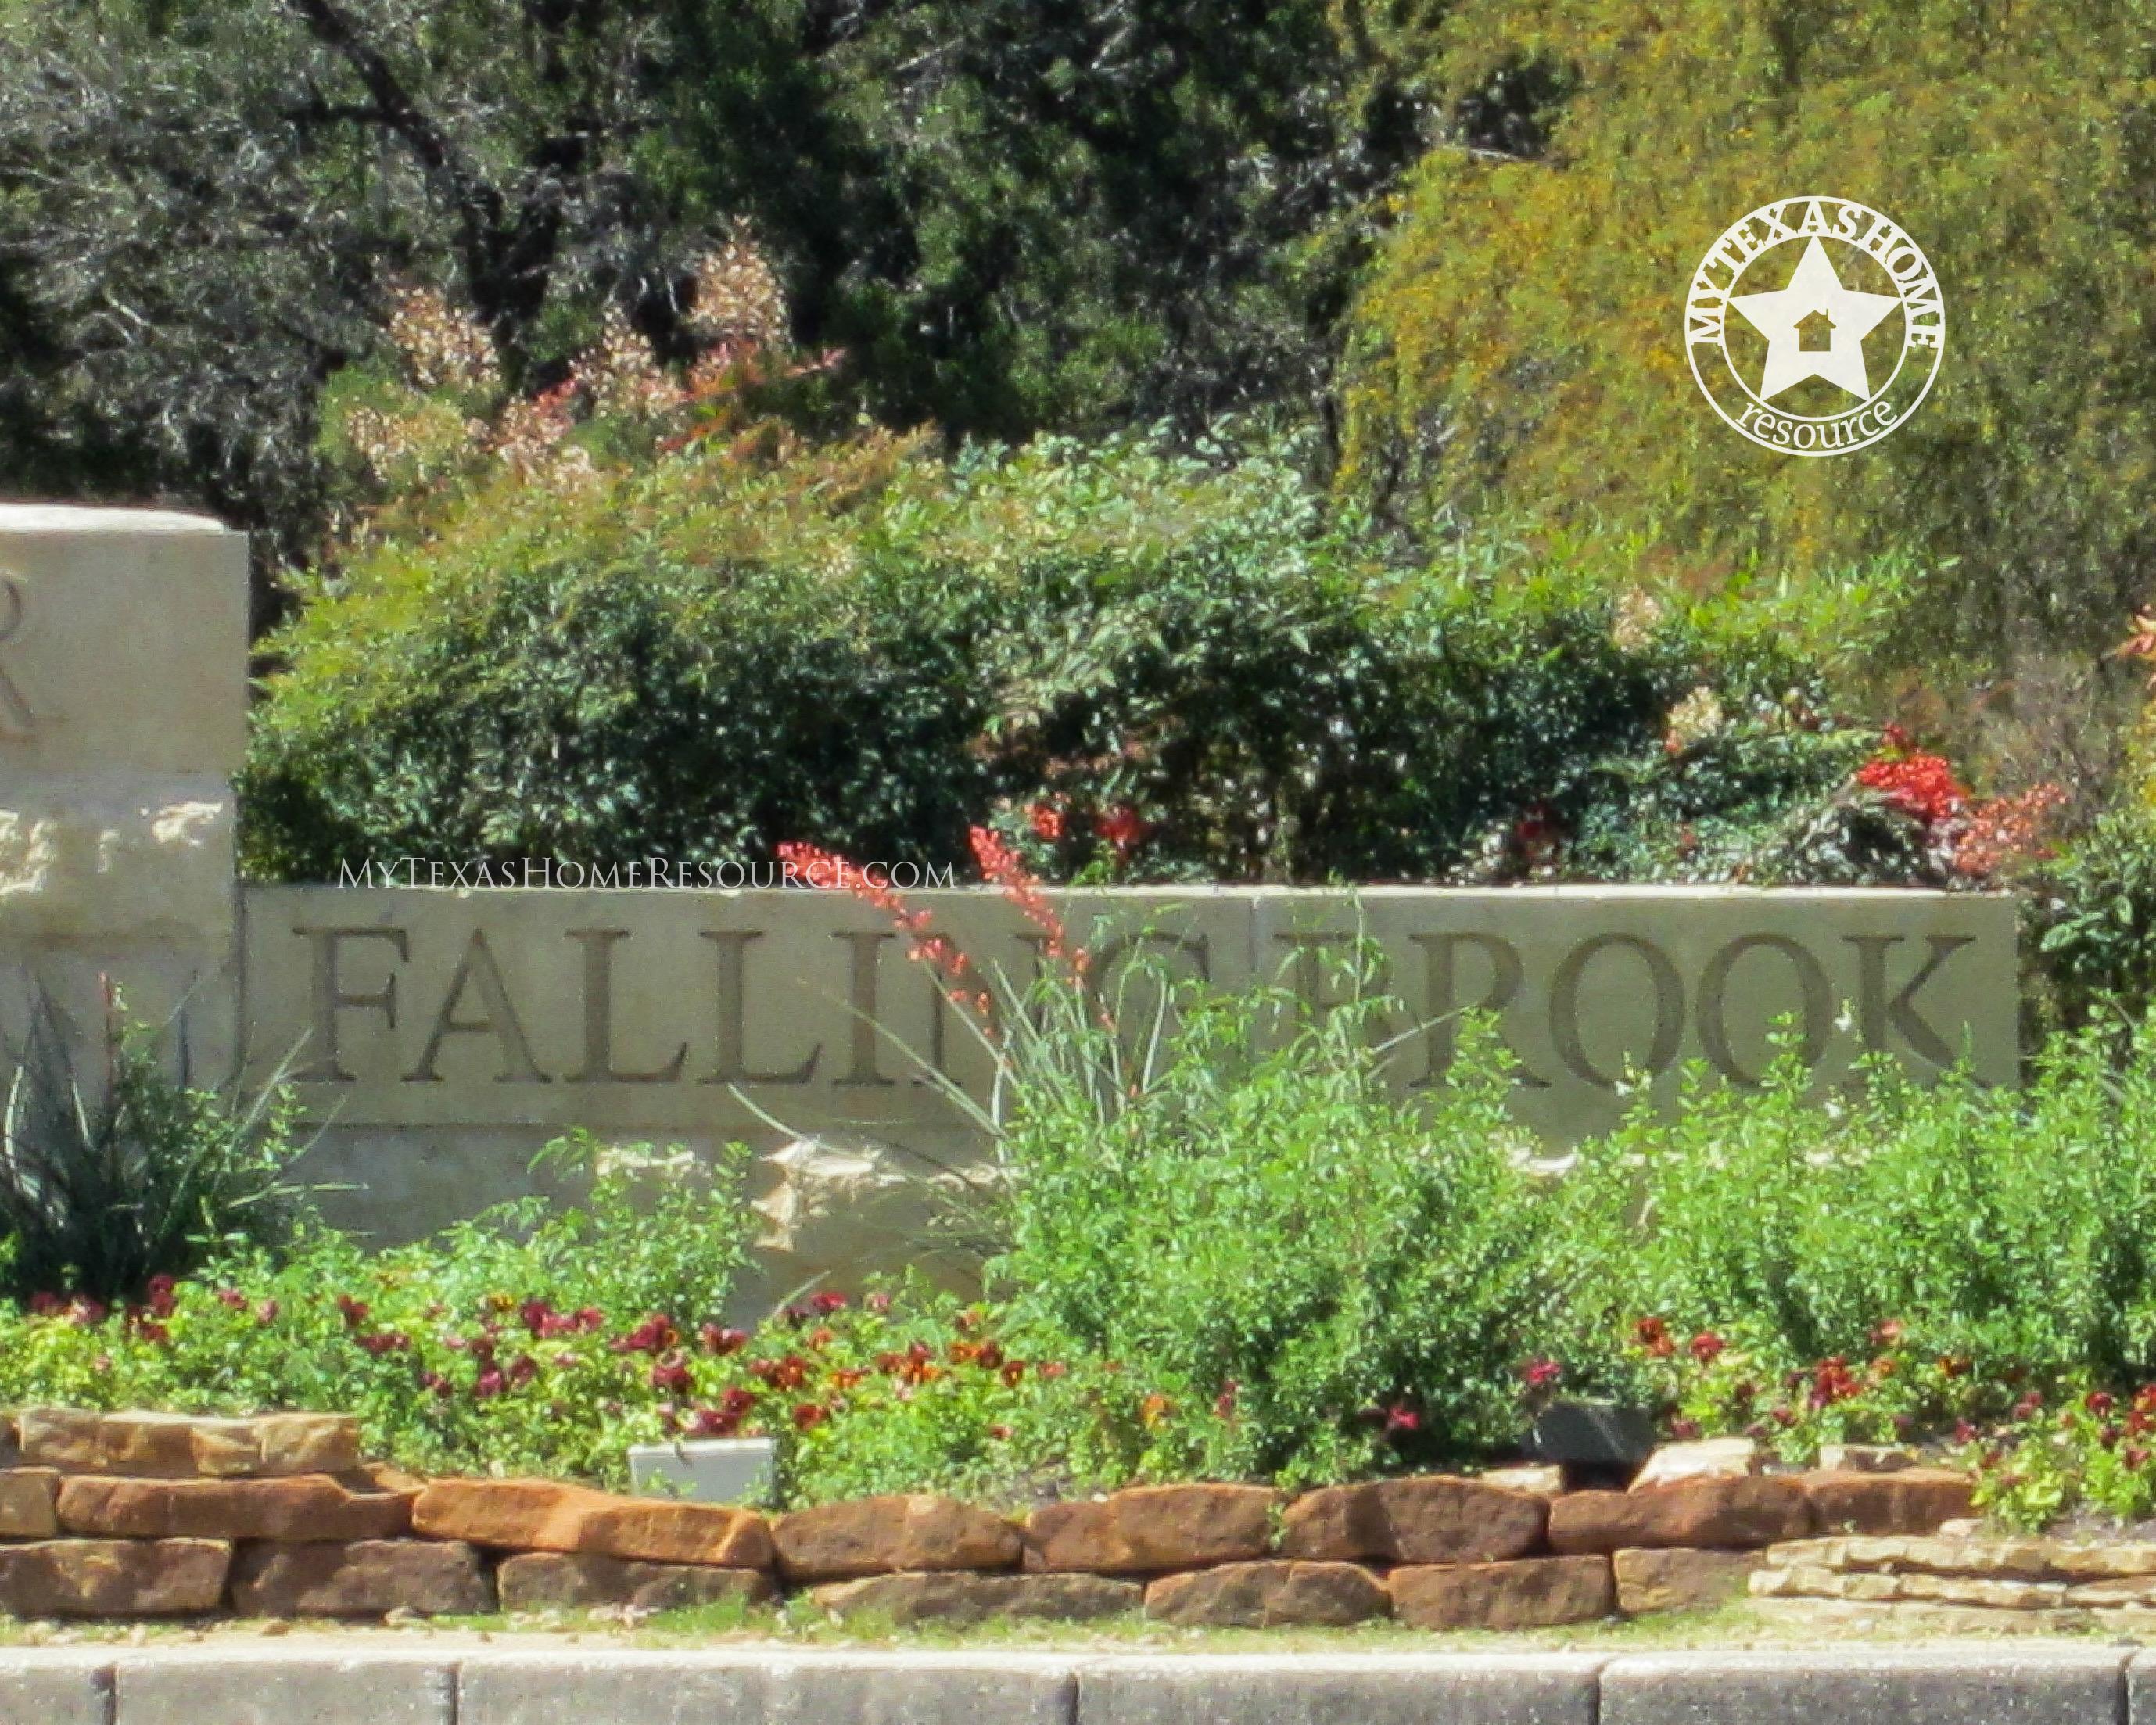 Falling Brook Community San Antonio, TX